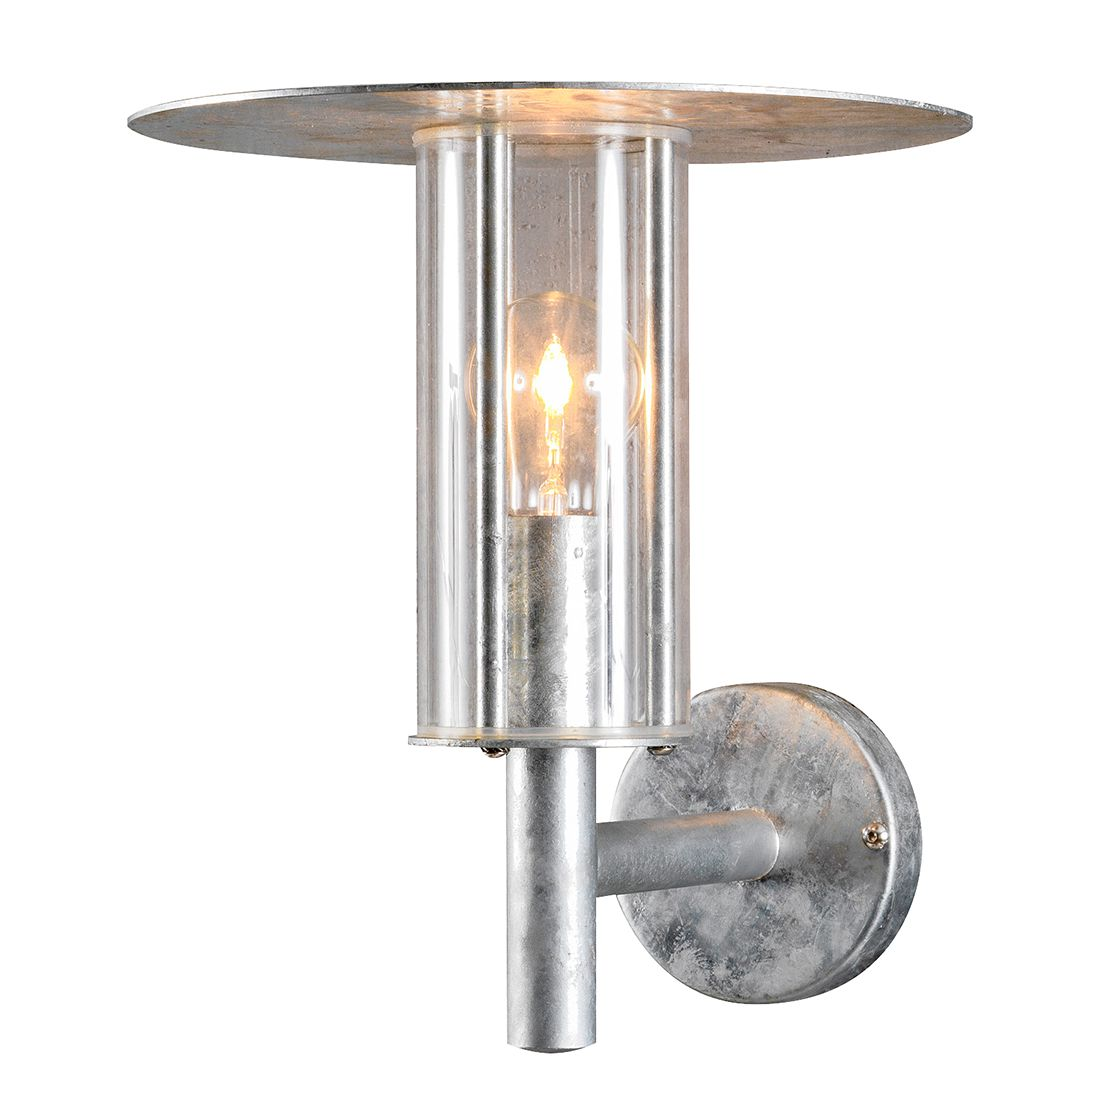 EEK A++, Außenleuchte Mode - Metall - 1-flammig, Konstsmide